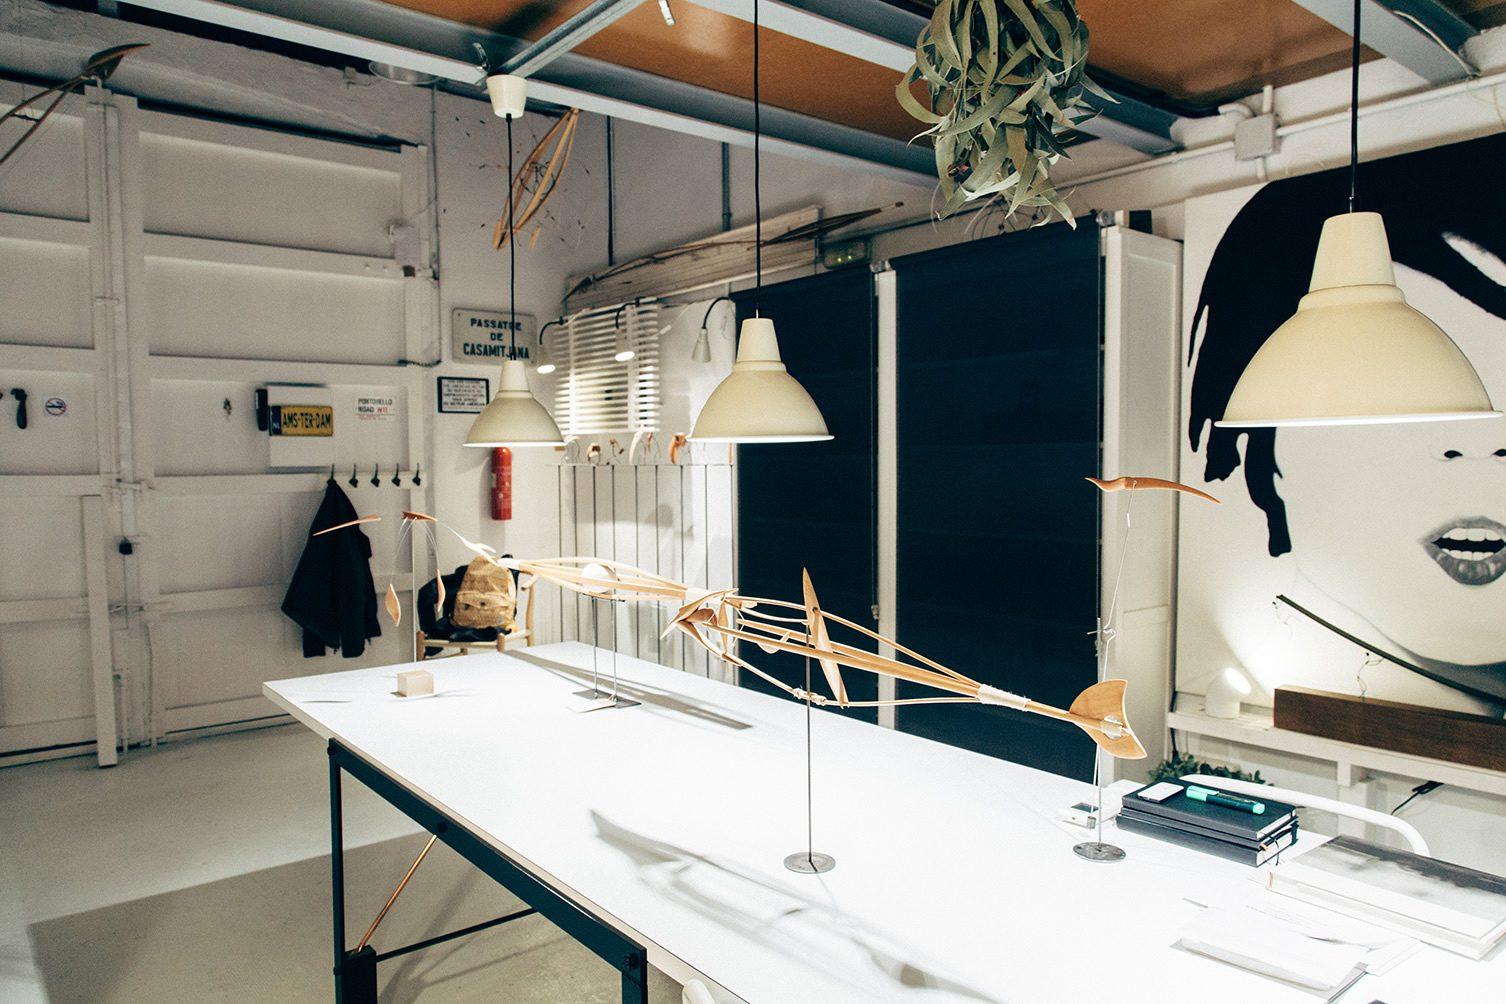 Antoni Yranzo sculpture workshop with trip4real